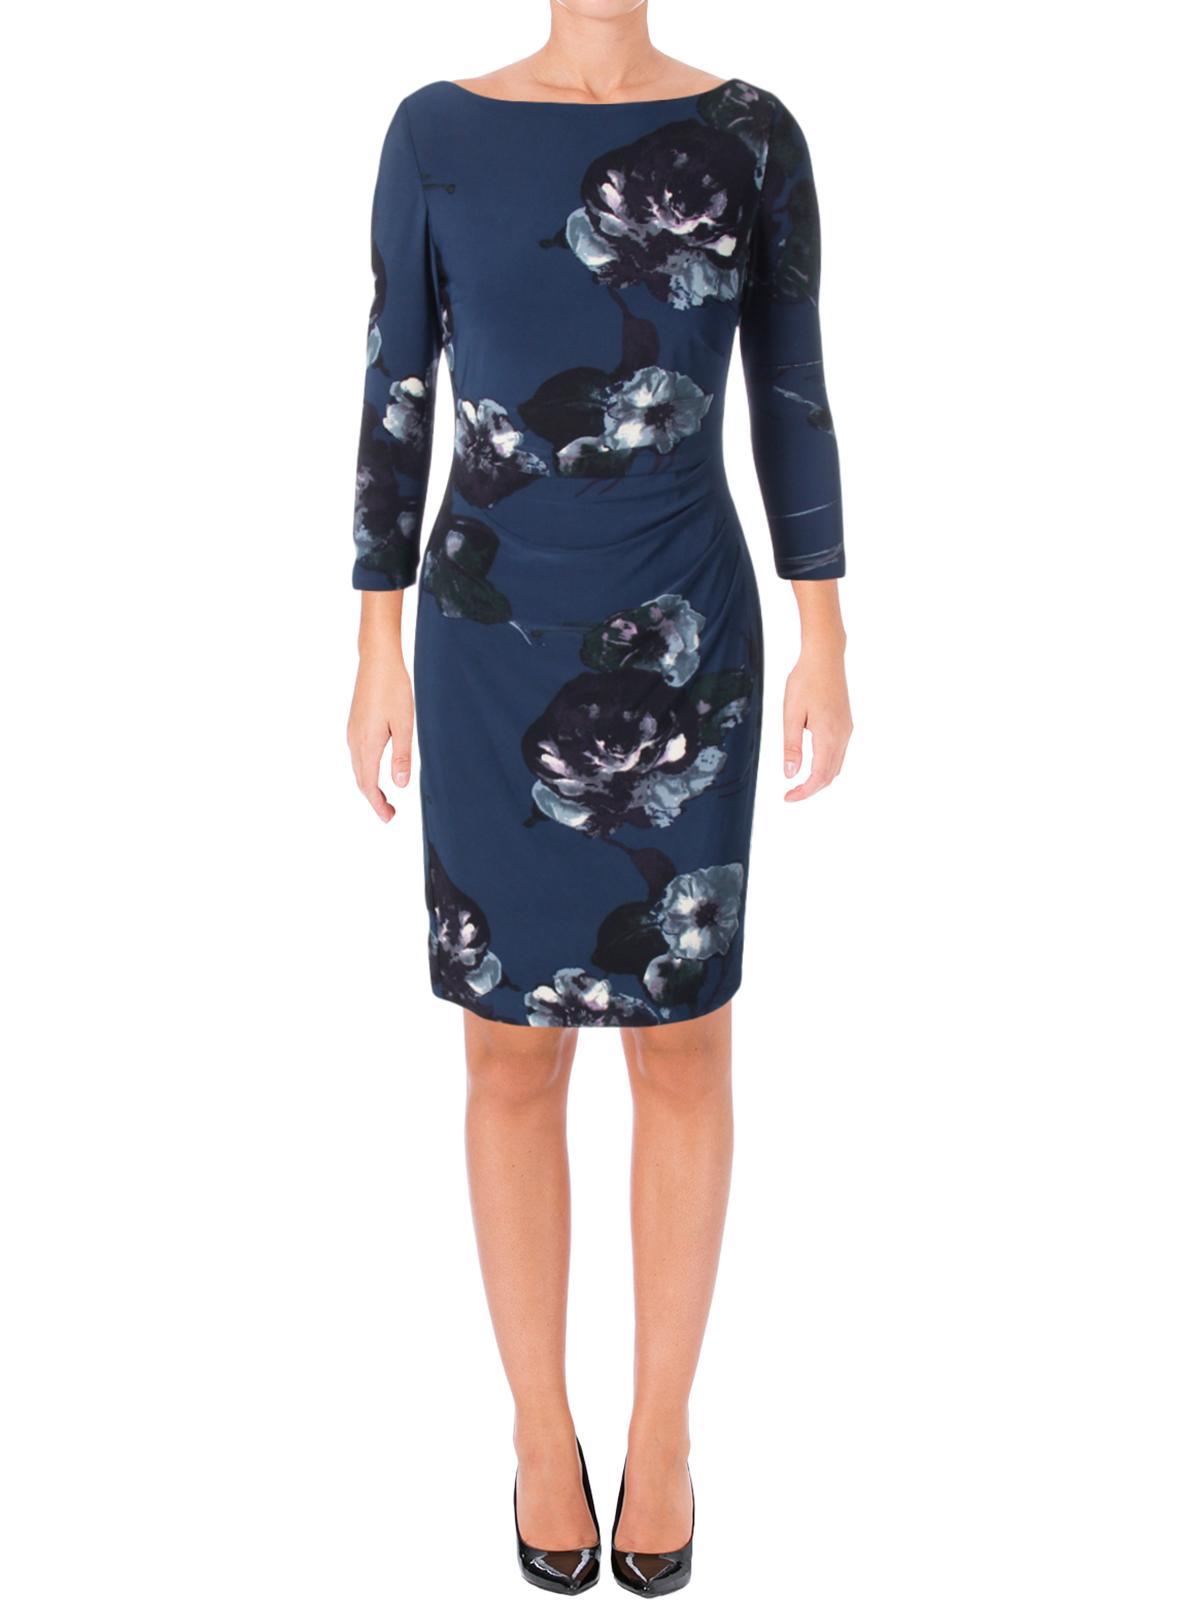 Lauren Ralph Lauren Womens Ruched Side Floral Print Wear to Work Dress